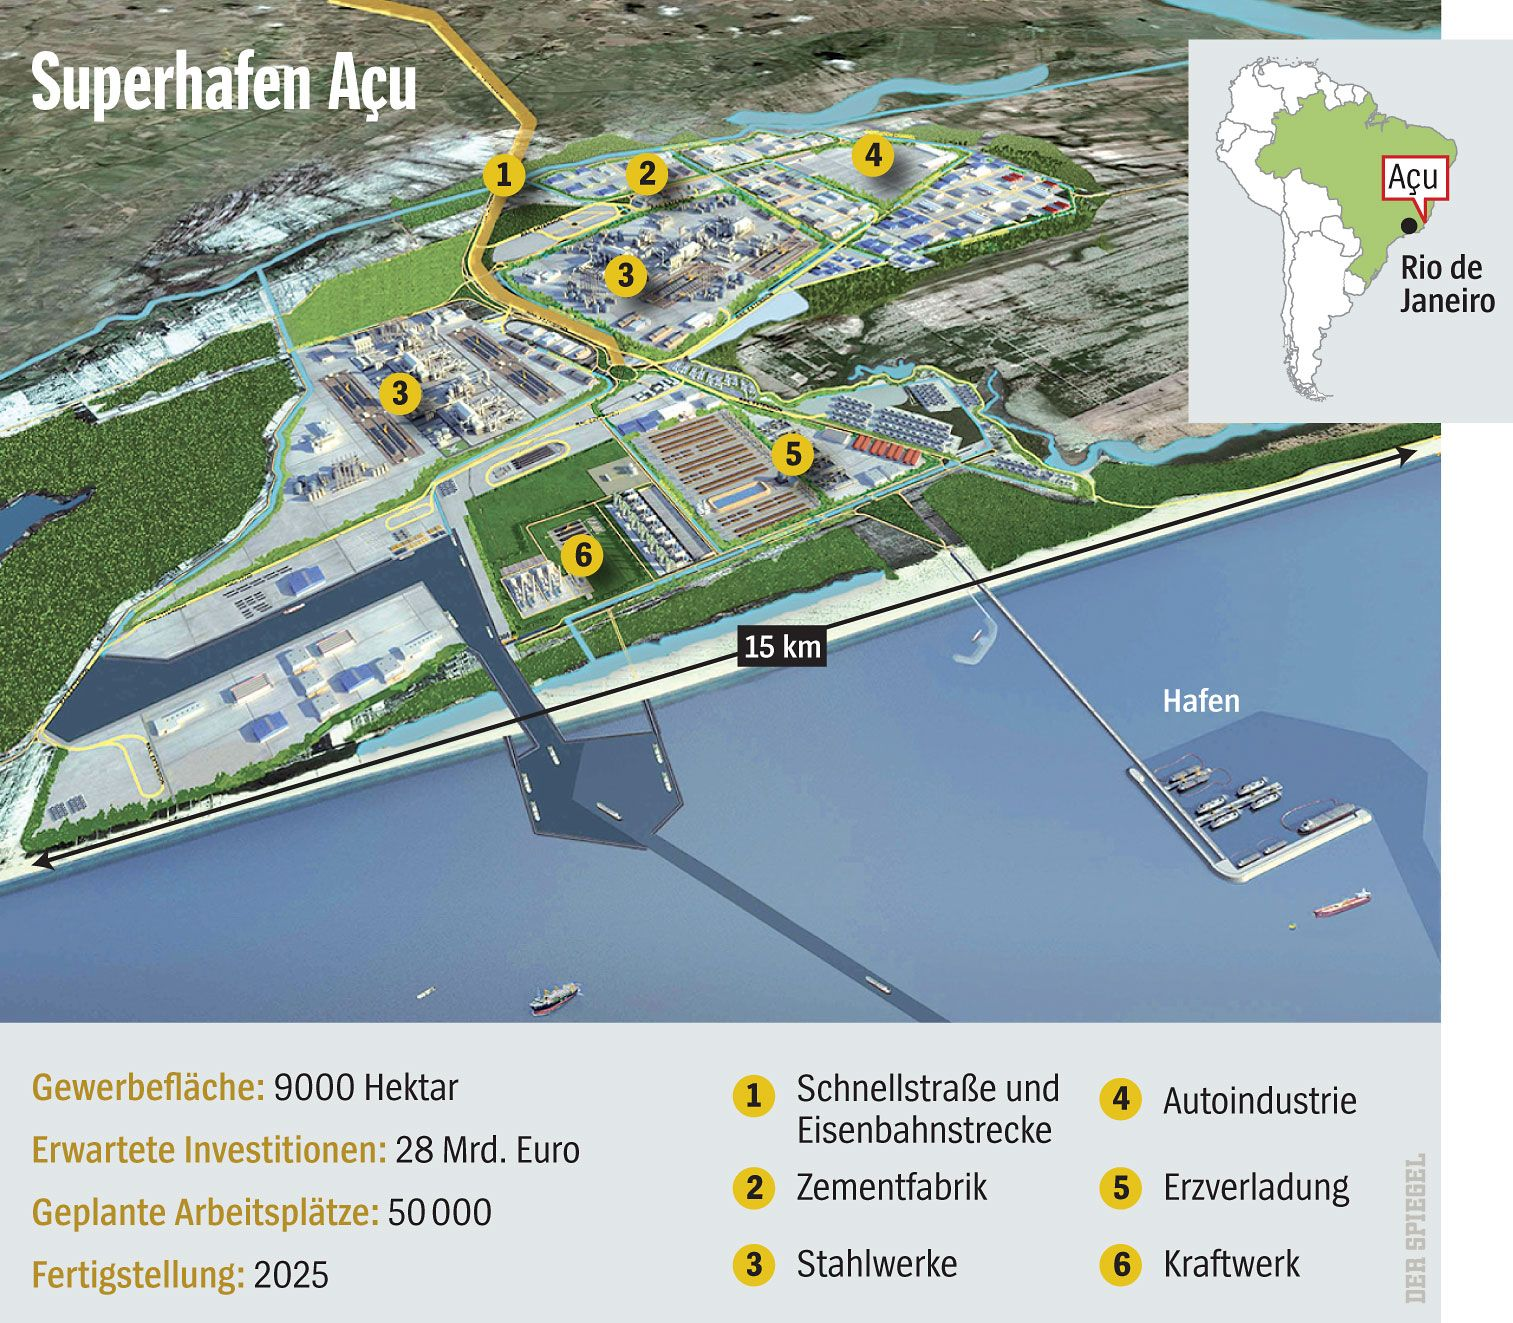 SP 15/2011 - Grafik Superhafen ACU